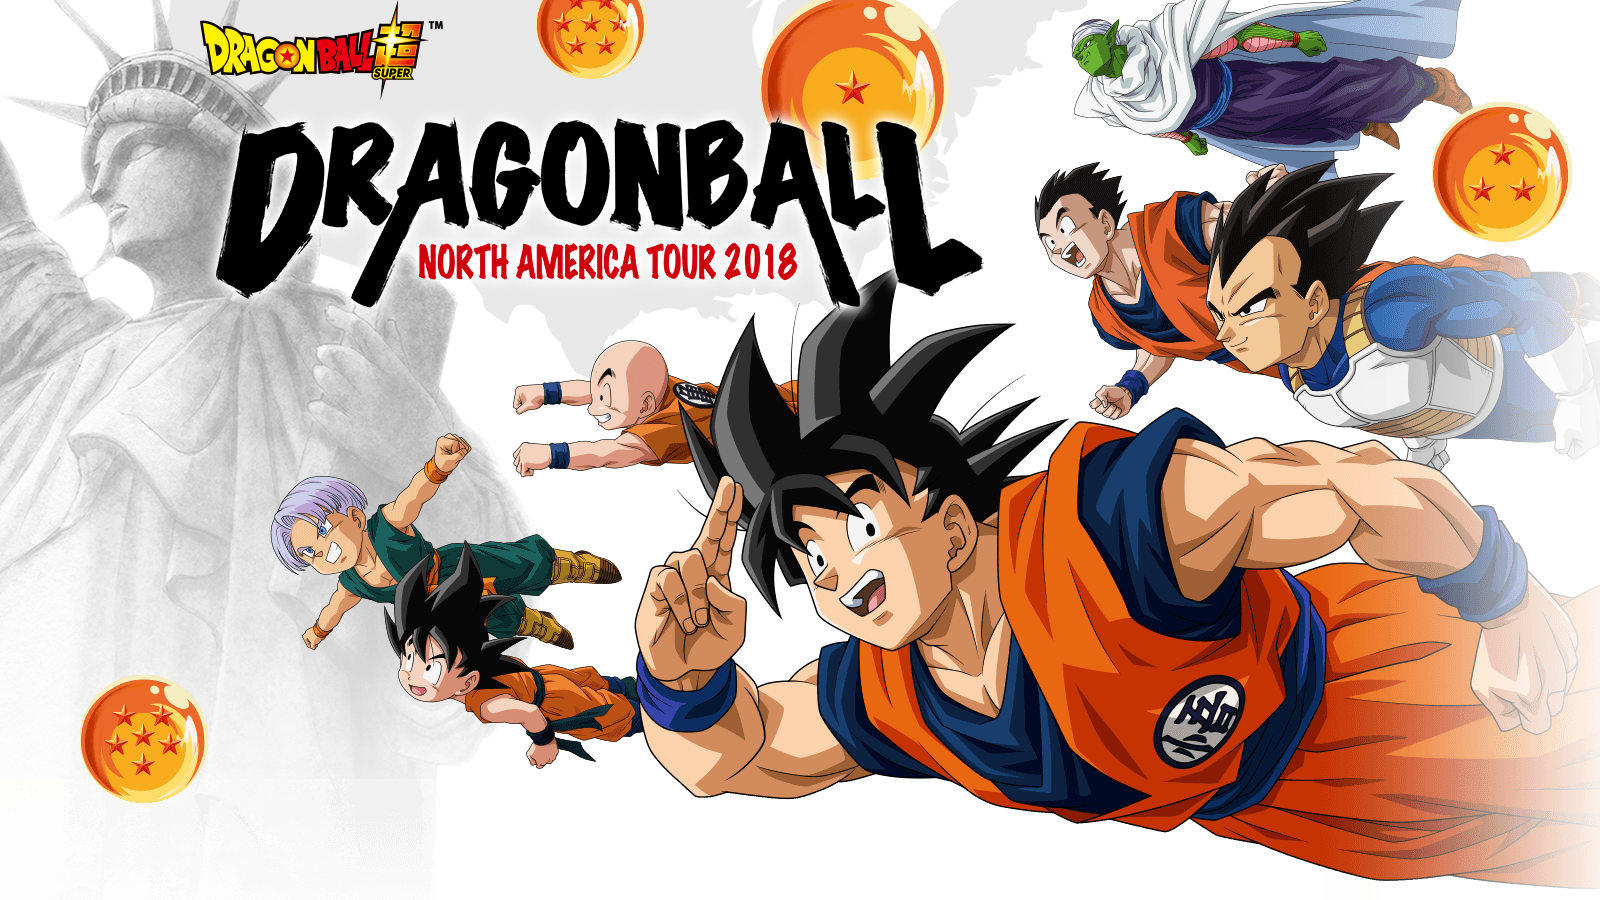 Press Release: THE DRAGON BALL NORTH AMERICA TOUR 2018; Seven City Tour Kicks-off in July at San Diego Comic-Con